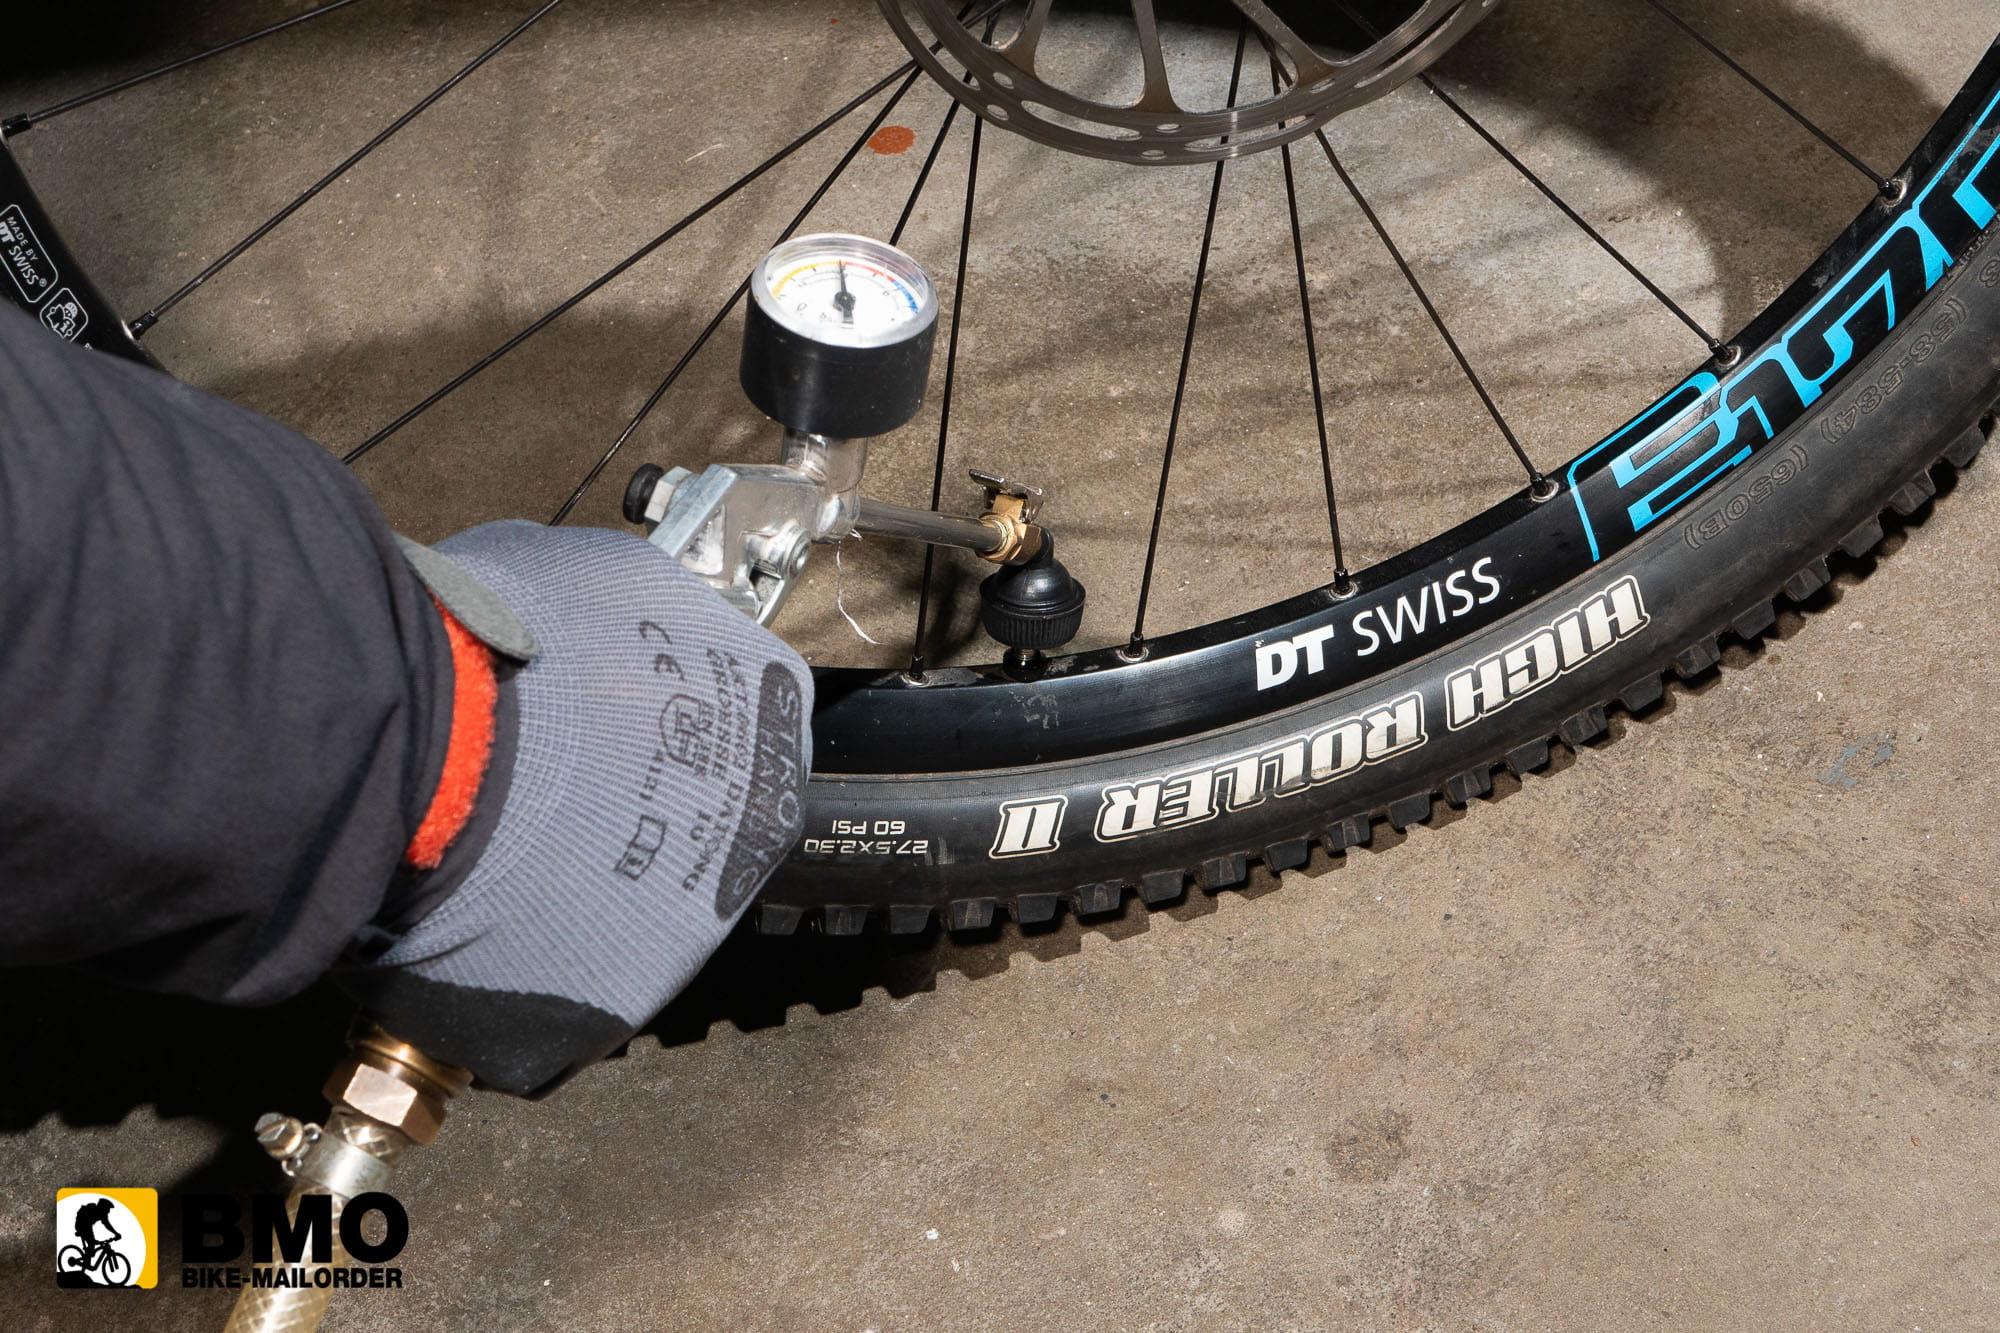 FCK-Flats-BMO-Bike-Mailorder-9